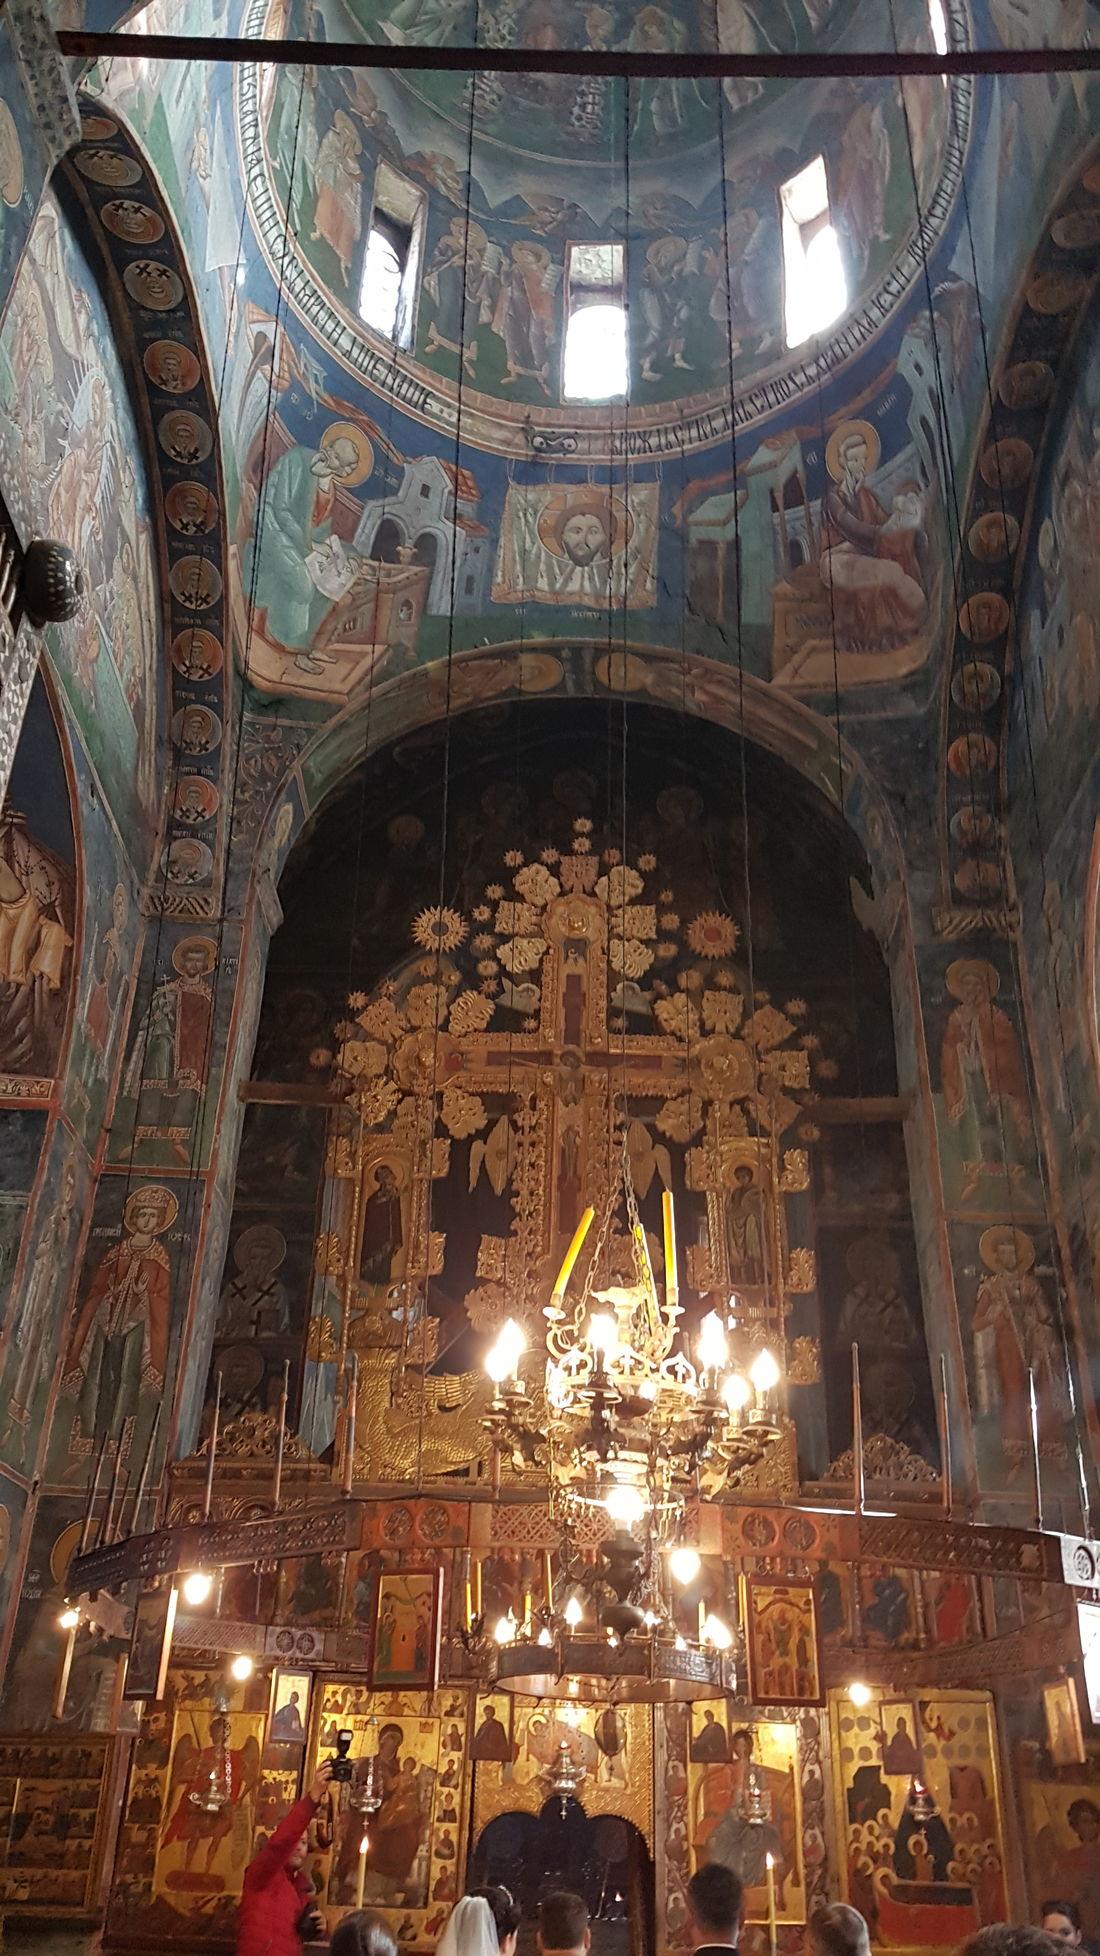 Manastir Morača, Kolašin Monastery Montenegro 🇲🇪 XII Century Curch Interior Curcharchitecture Fresco Decorations Religion Travel Destinations